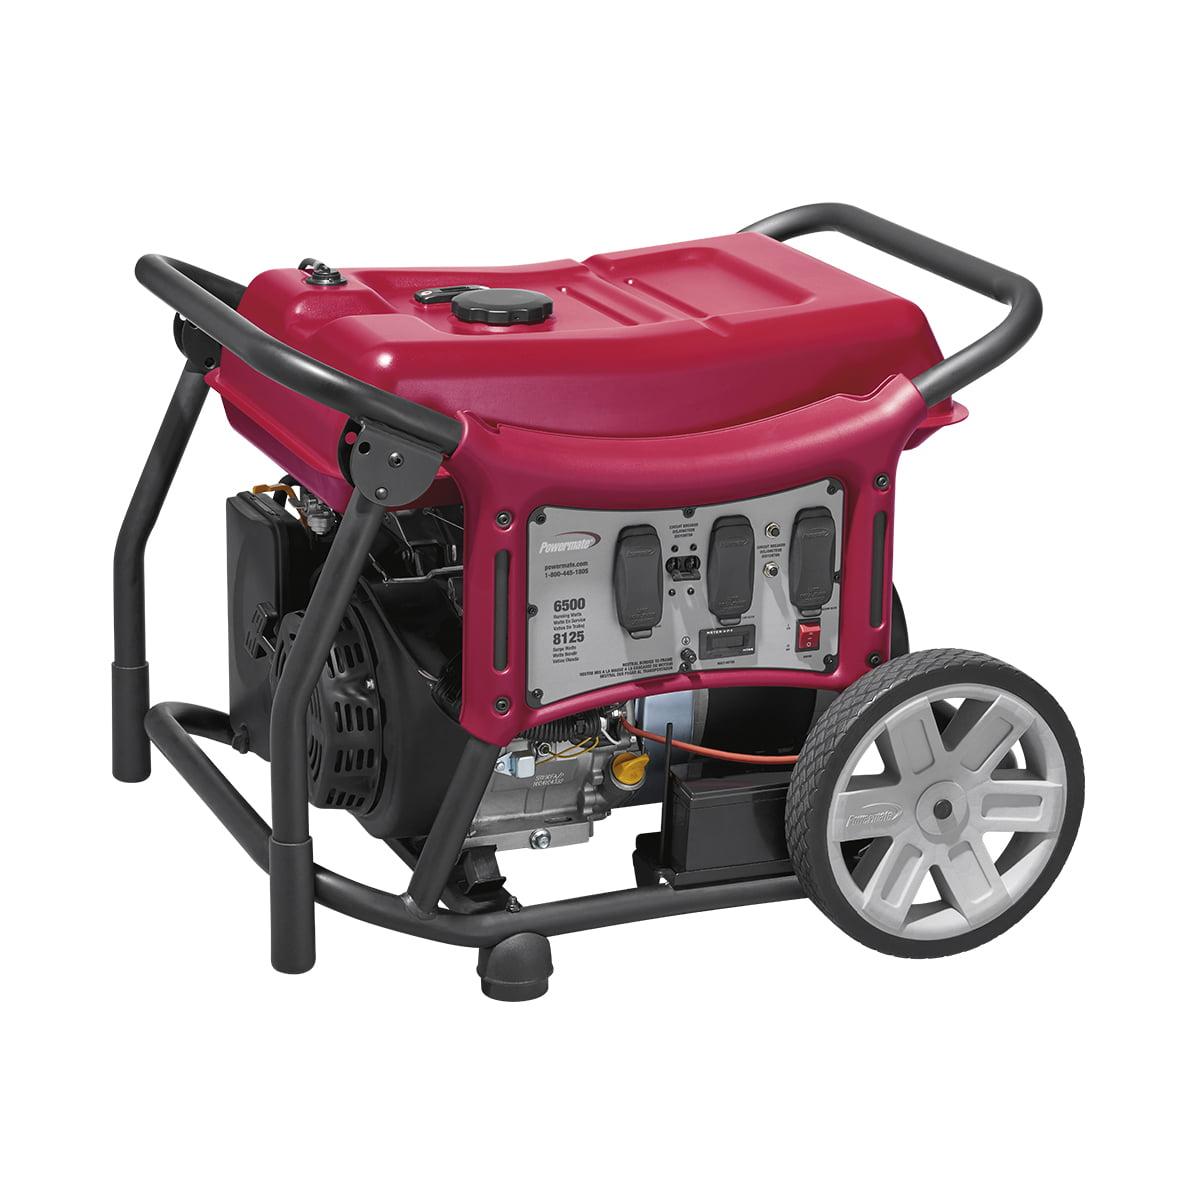 Powermate 6500 Watt Electric Start Portable Generator, 49 State/CSA - PC0146500